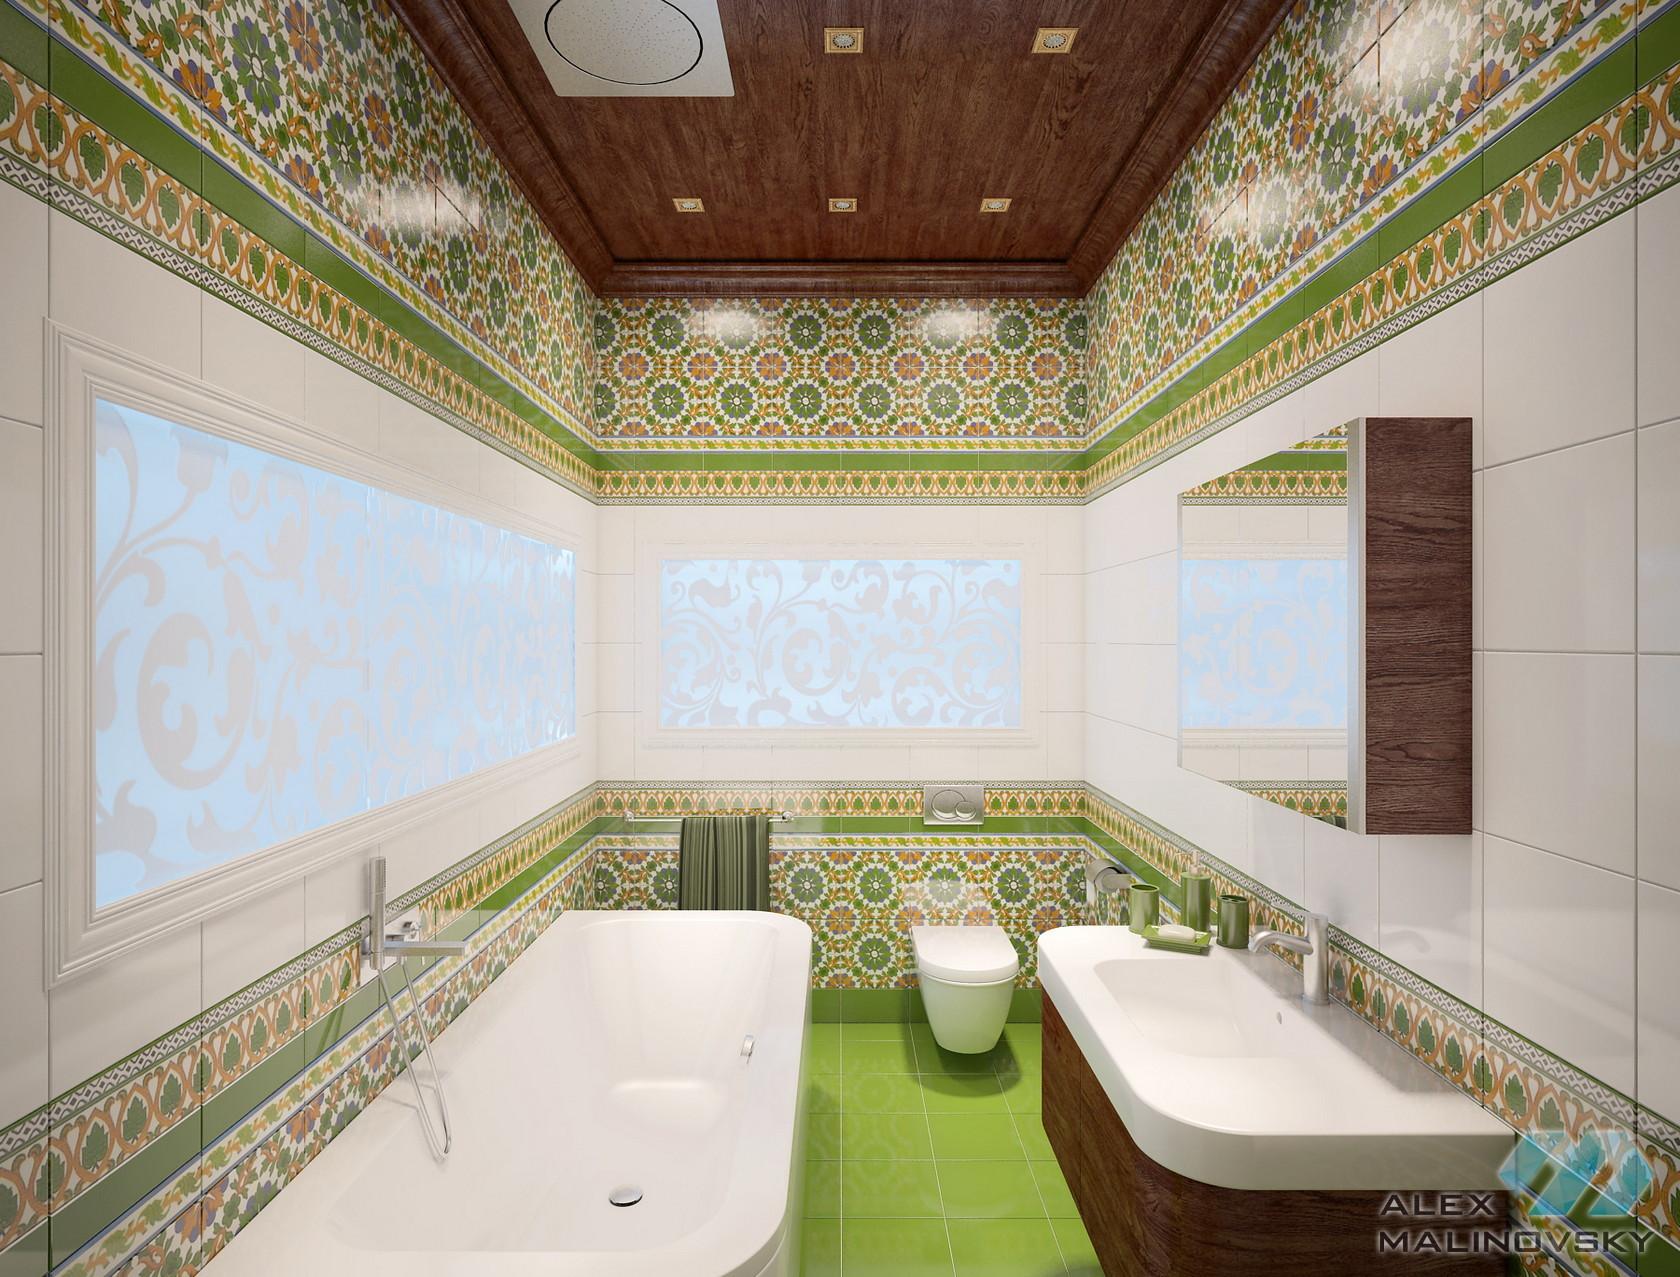 Ванная, 2х комнатная квартира, ЖК Веллтонпарк, Москва